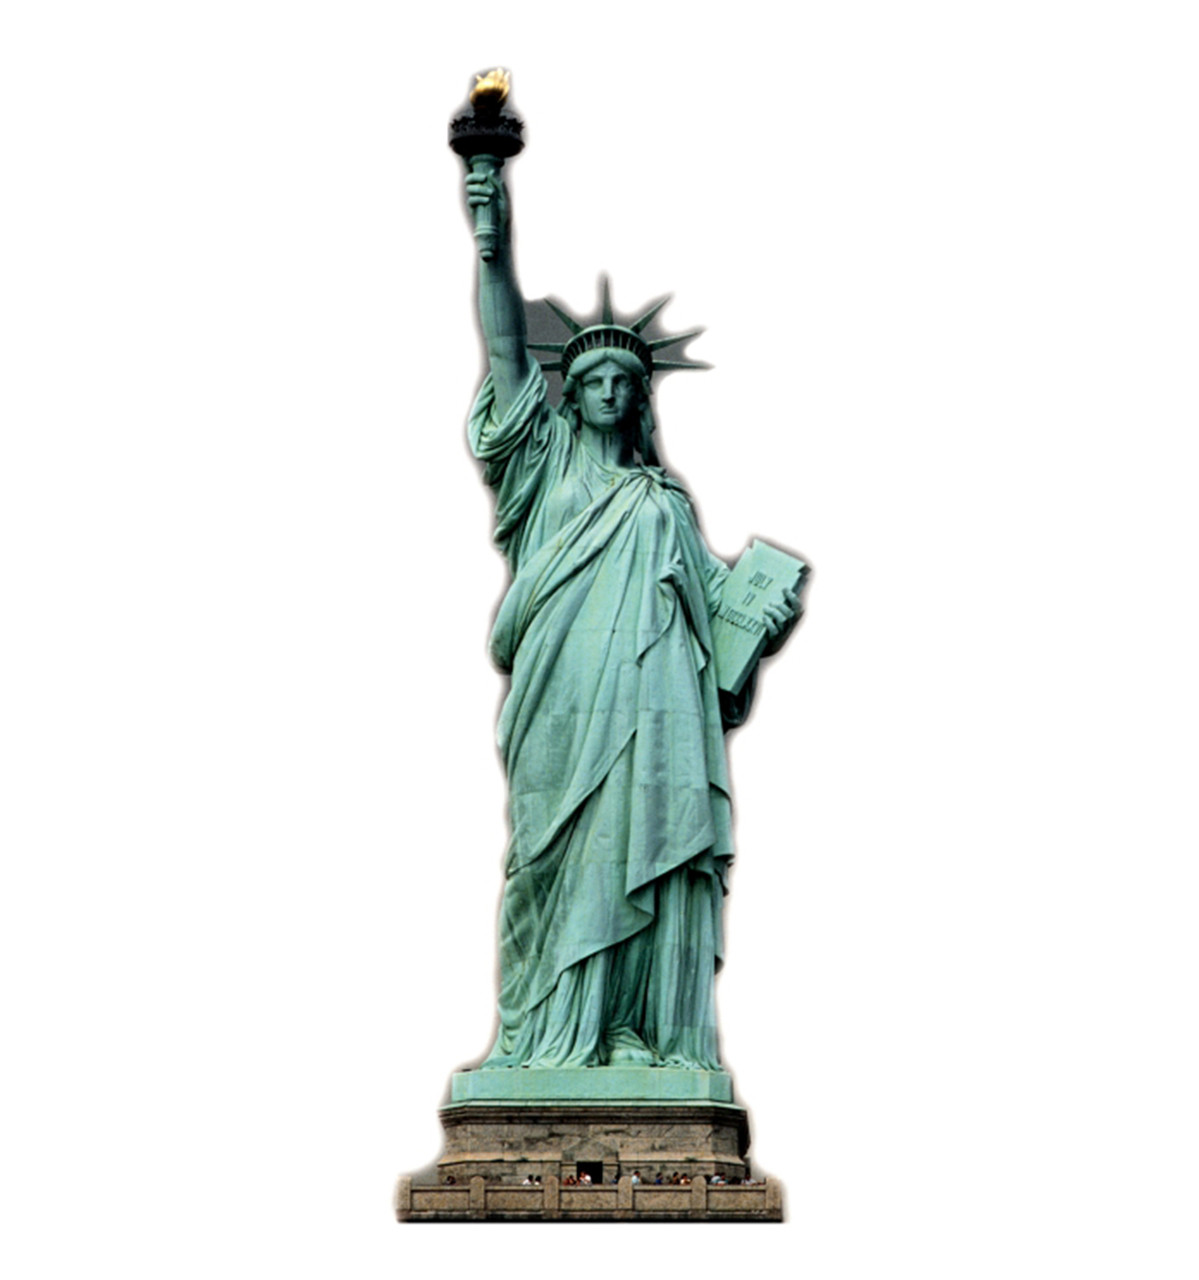 Life-size Statue of Liberty Cardboard Standup | Cardboard Cutout